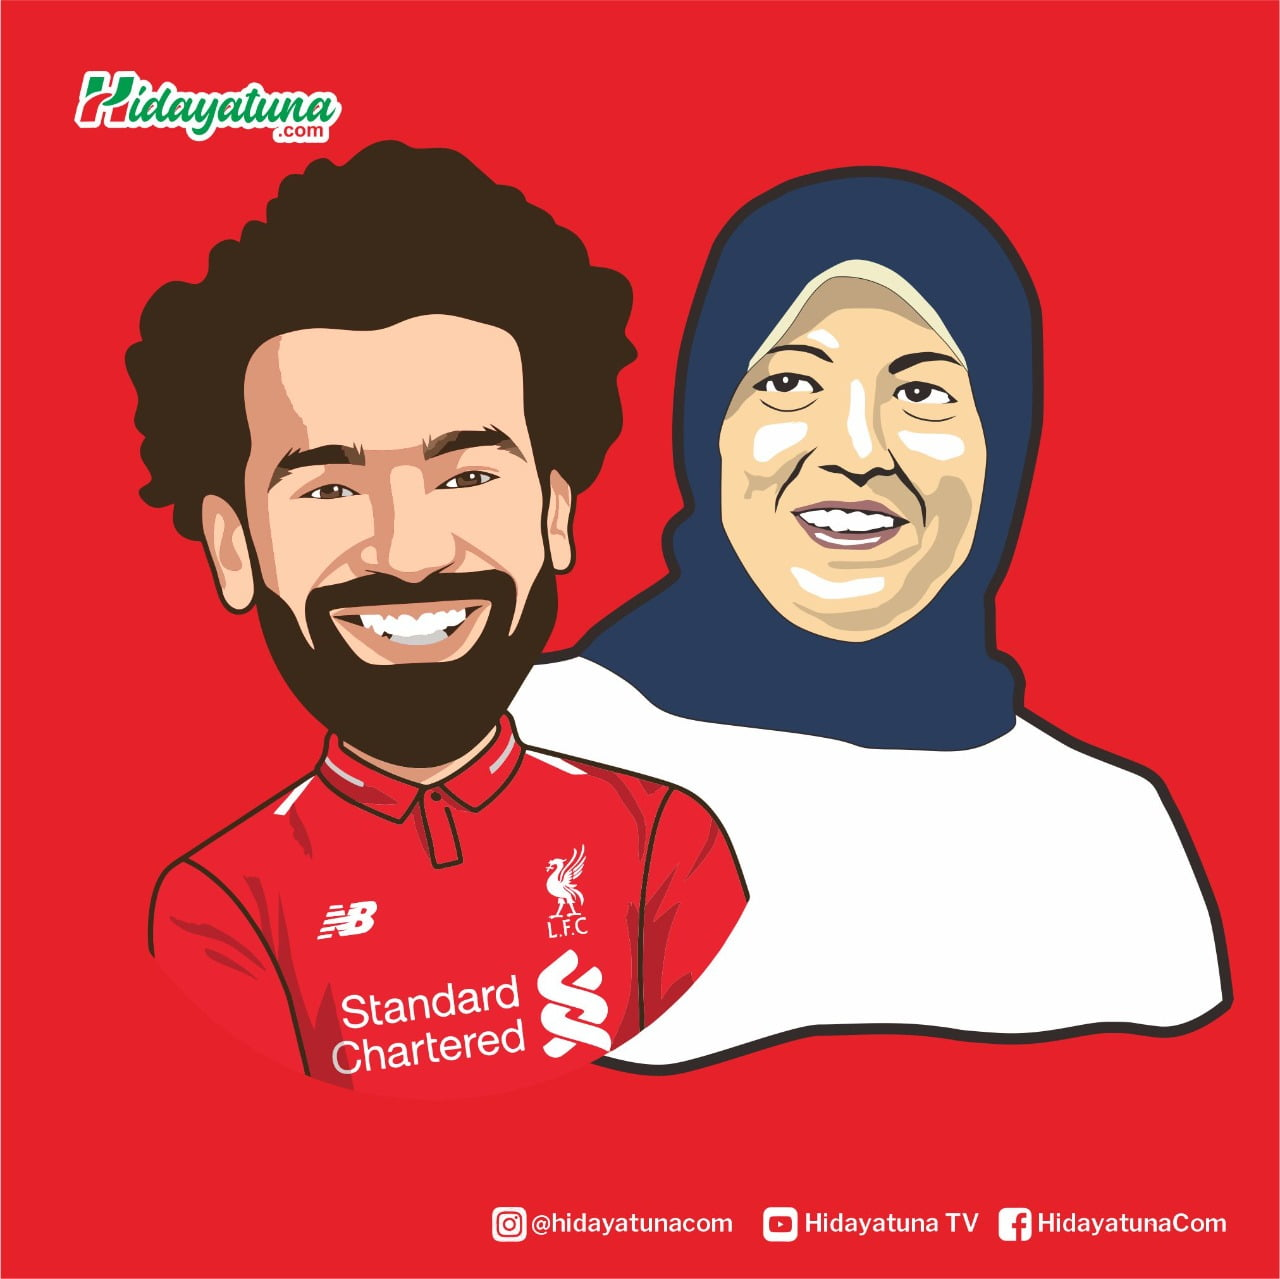 Mohamed Salah (Ilustrasi/Hidayatuna)